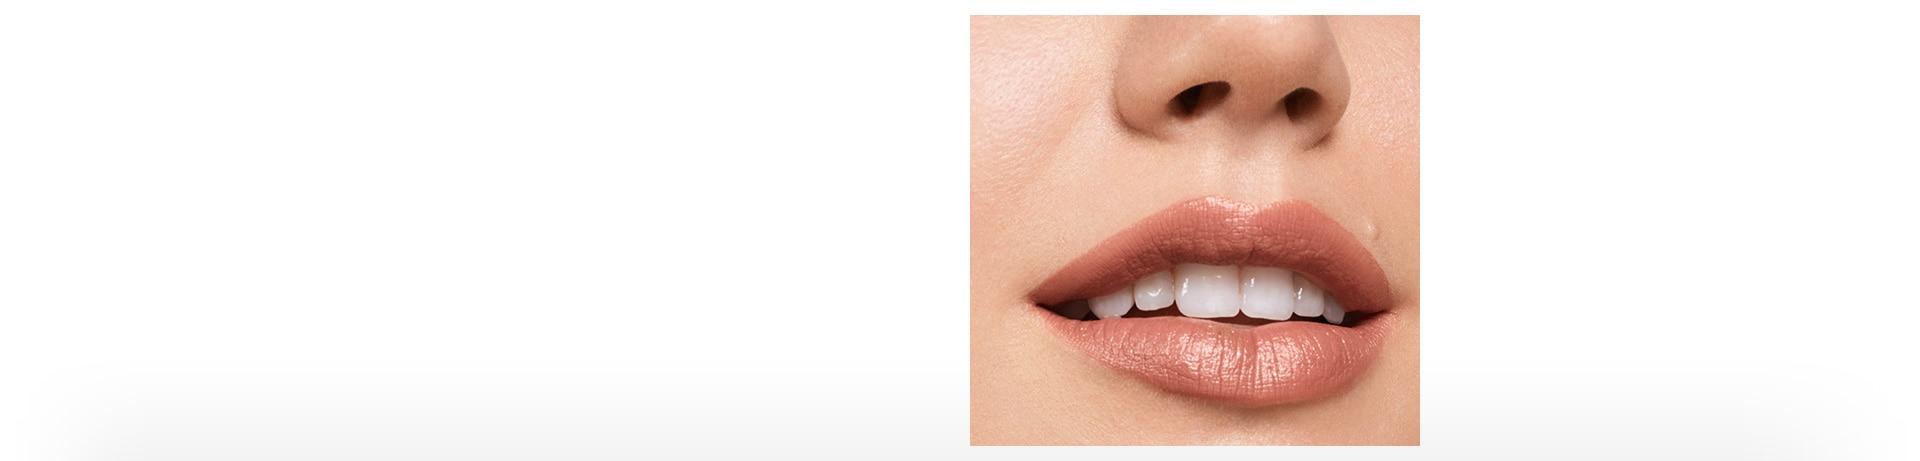 Clinique lipstick blushing nude